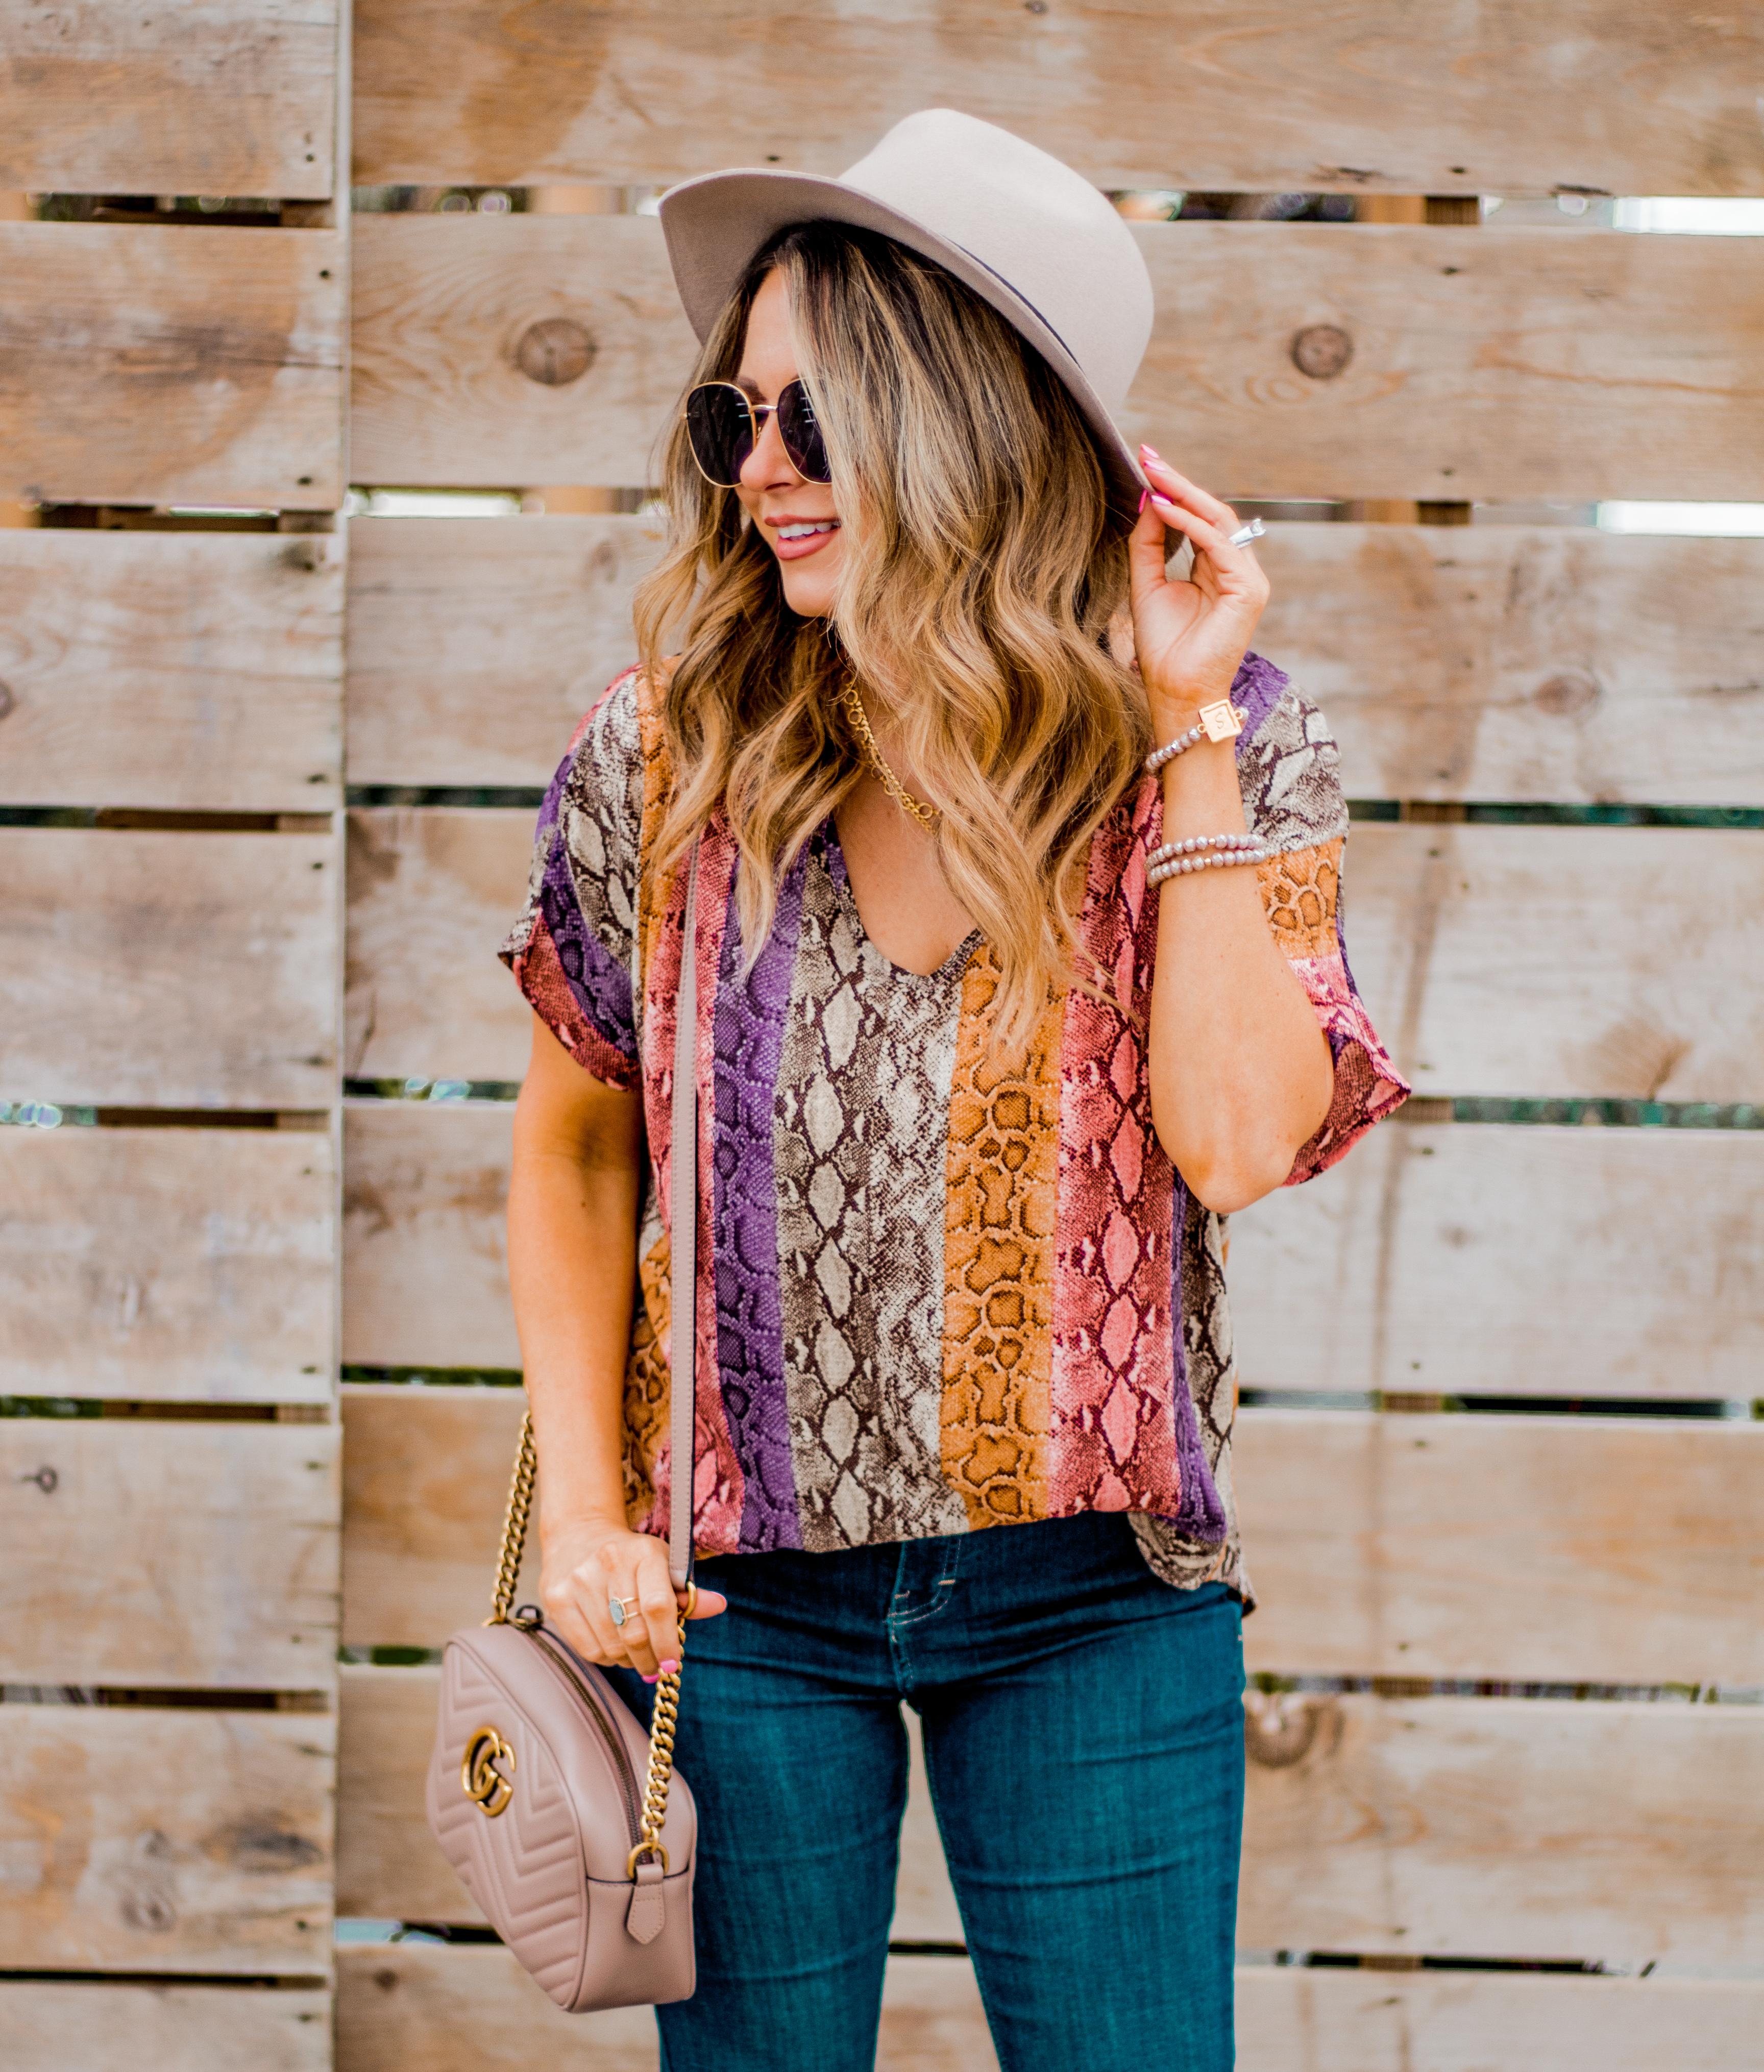 Women's Fashion - Snakeskin Print - Snakeskin Trend - Spring Fashion Trend - Omaha Fashion Blog - Boho Vibes - Flare Jeans - 16